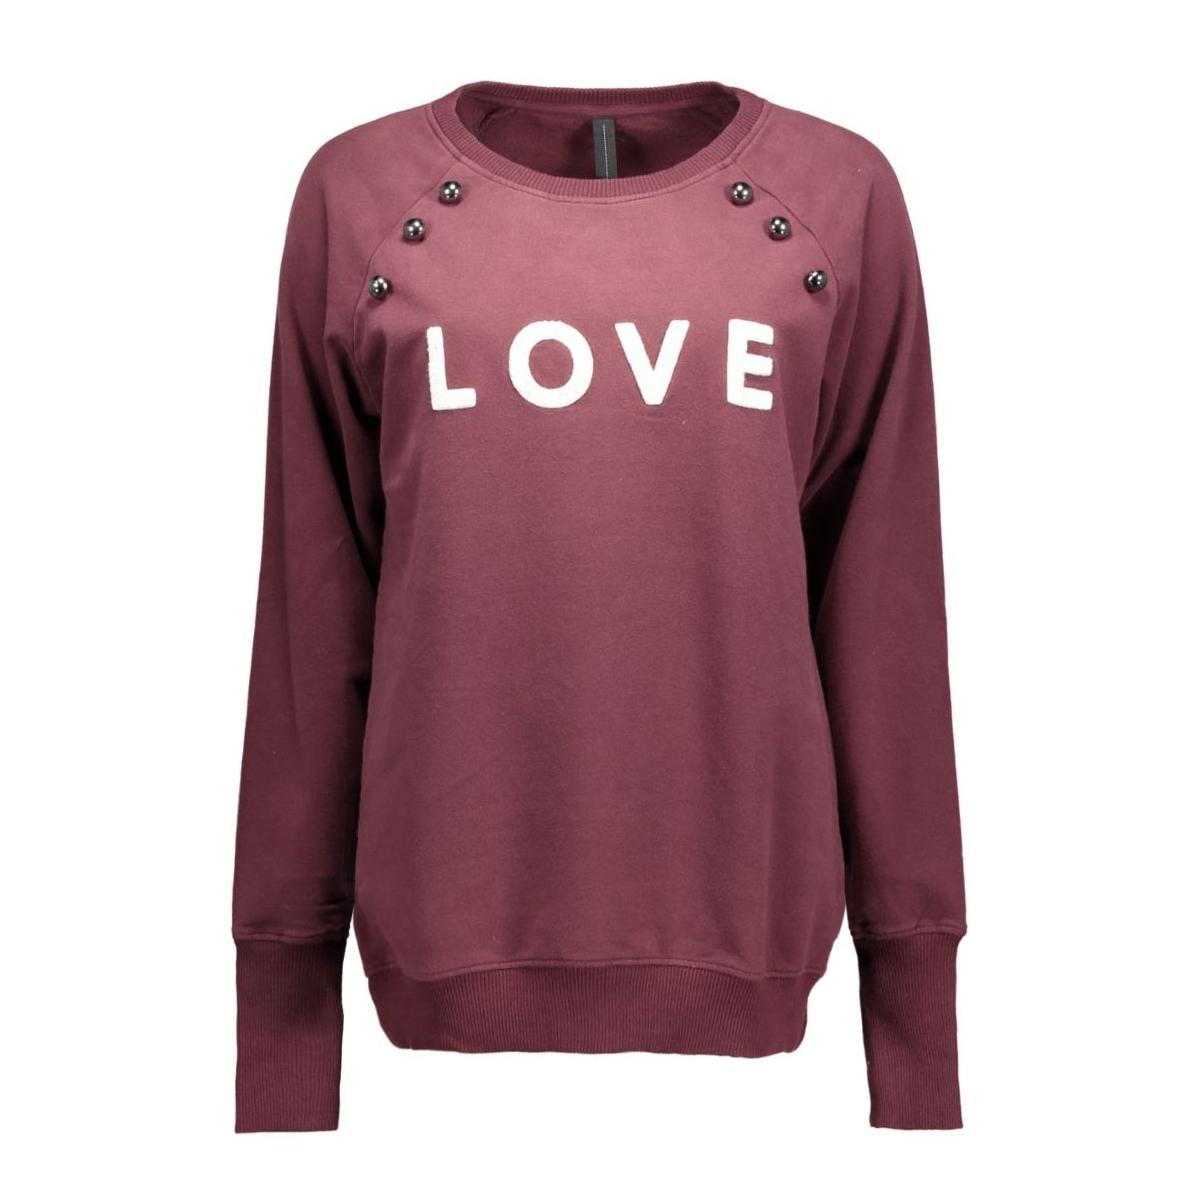 16wi803 10 days sweater bordeaux